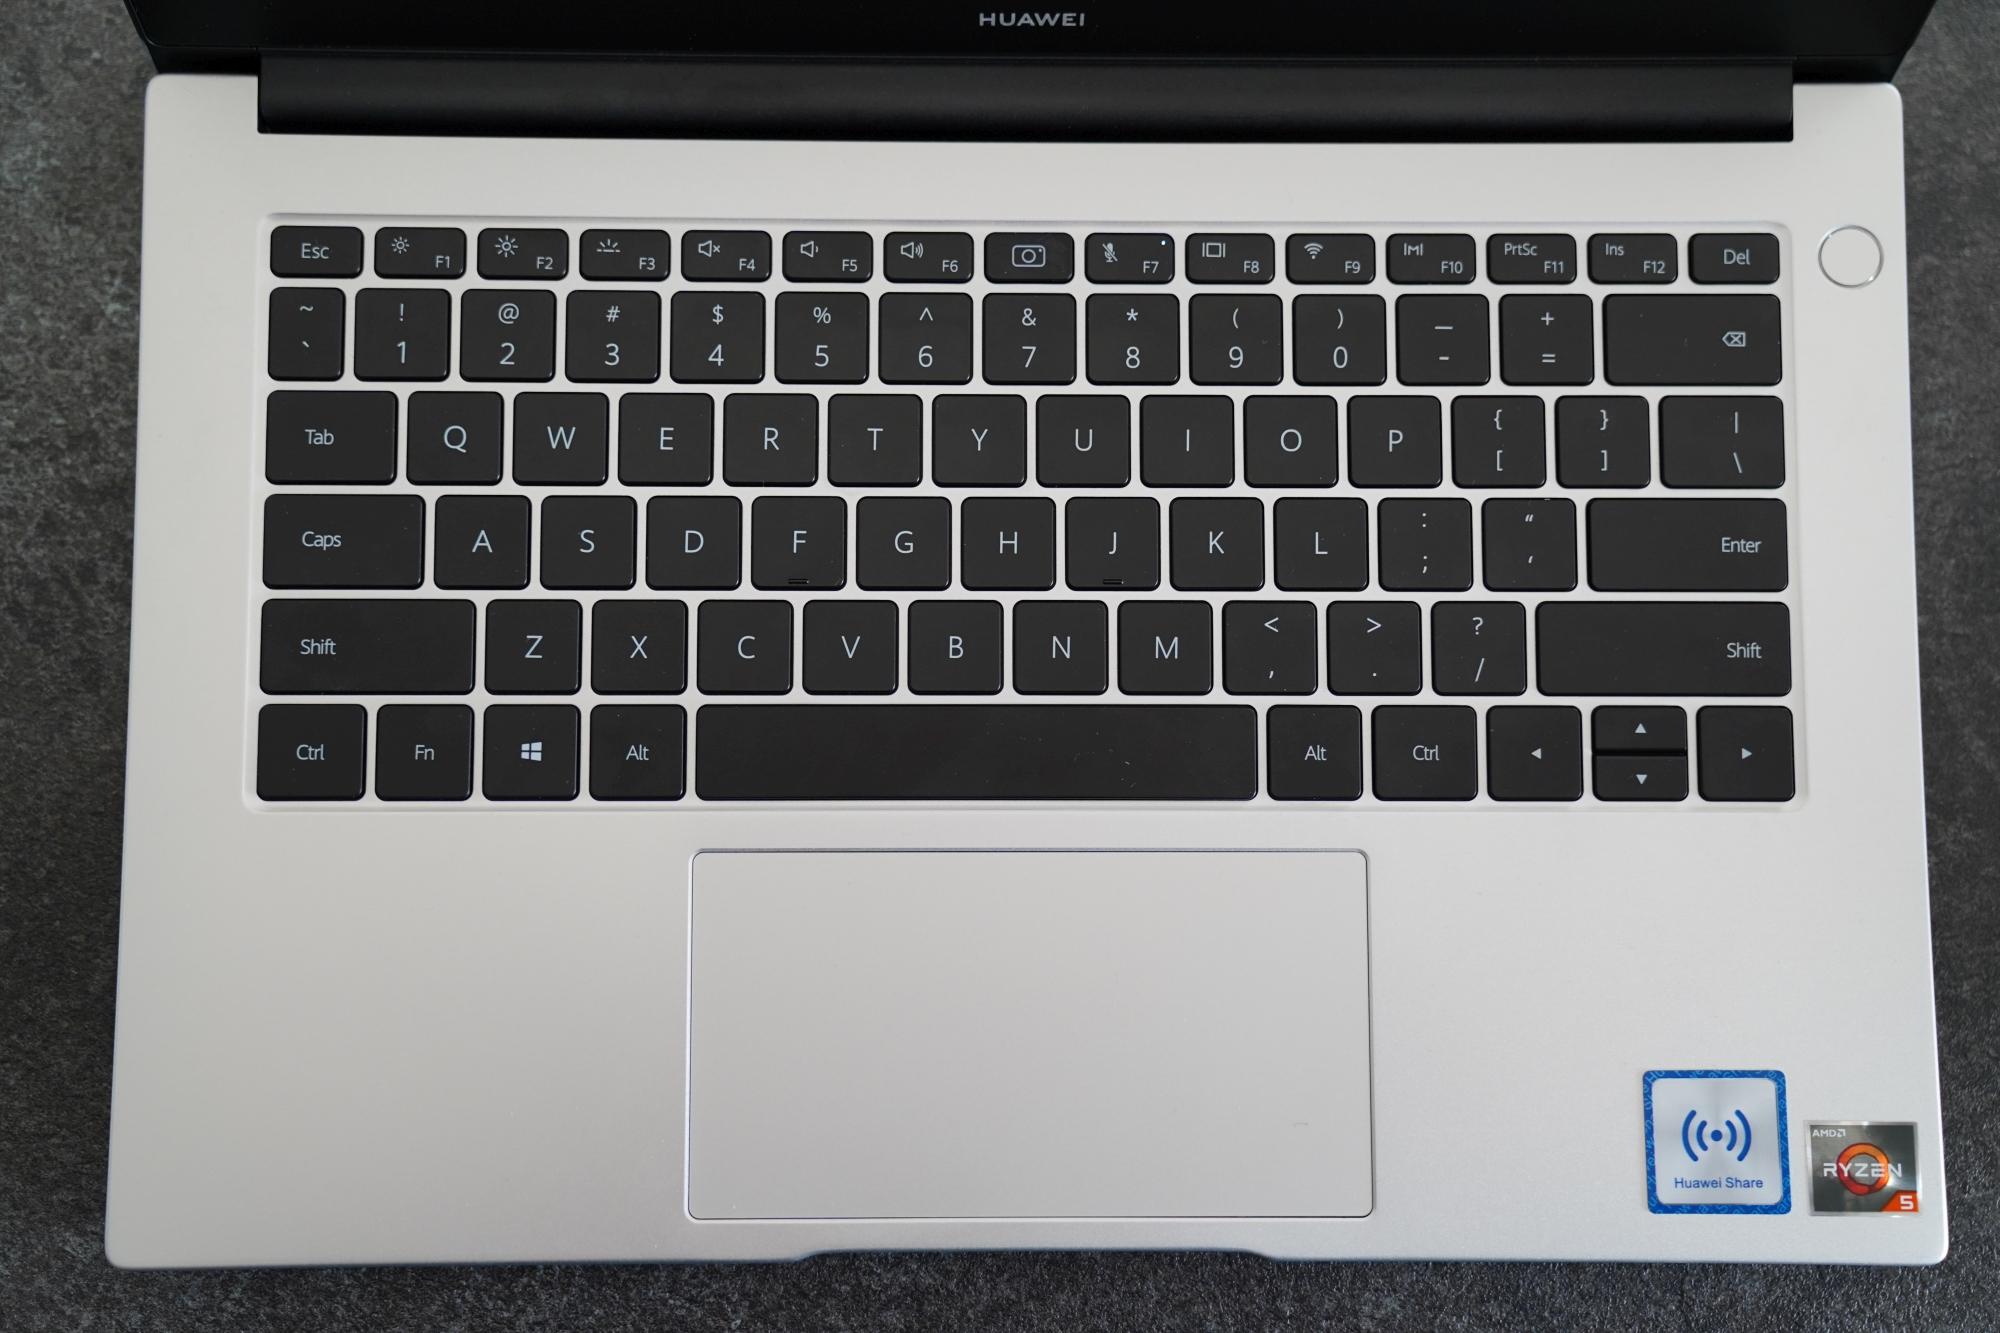 Huawei Matebook D 14 2020 - do biura jak znalazł (recenzja)